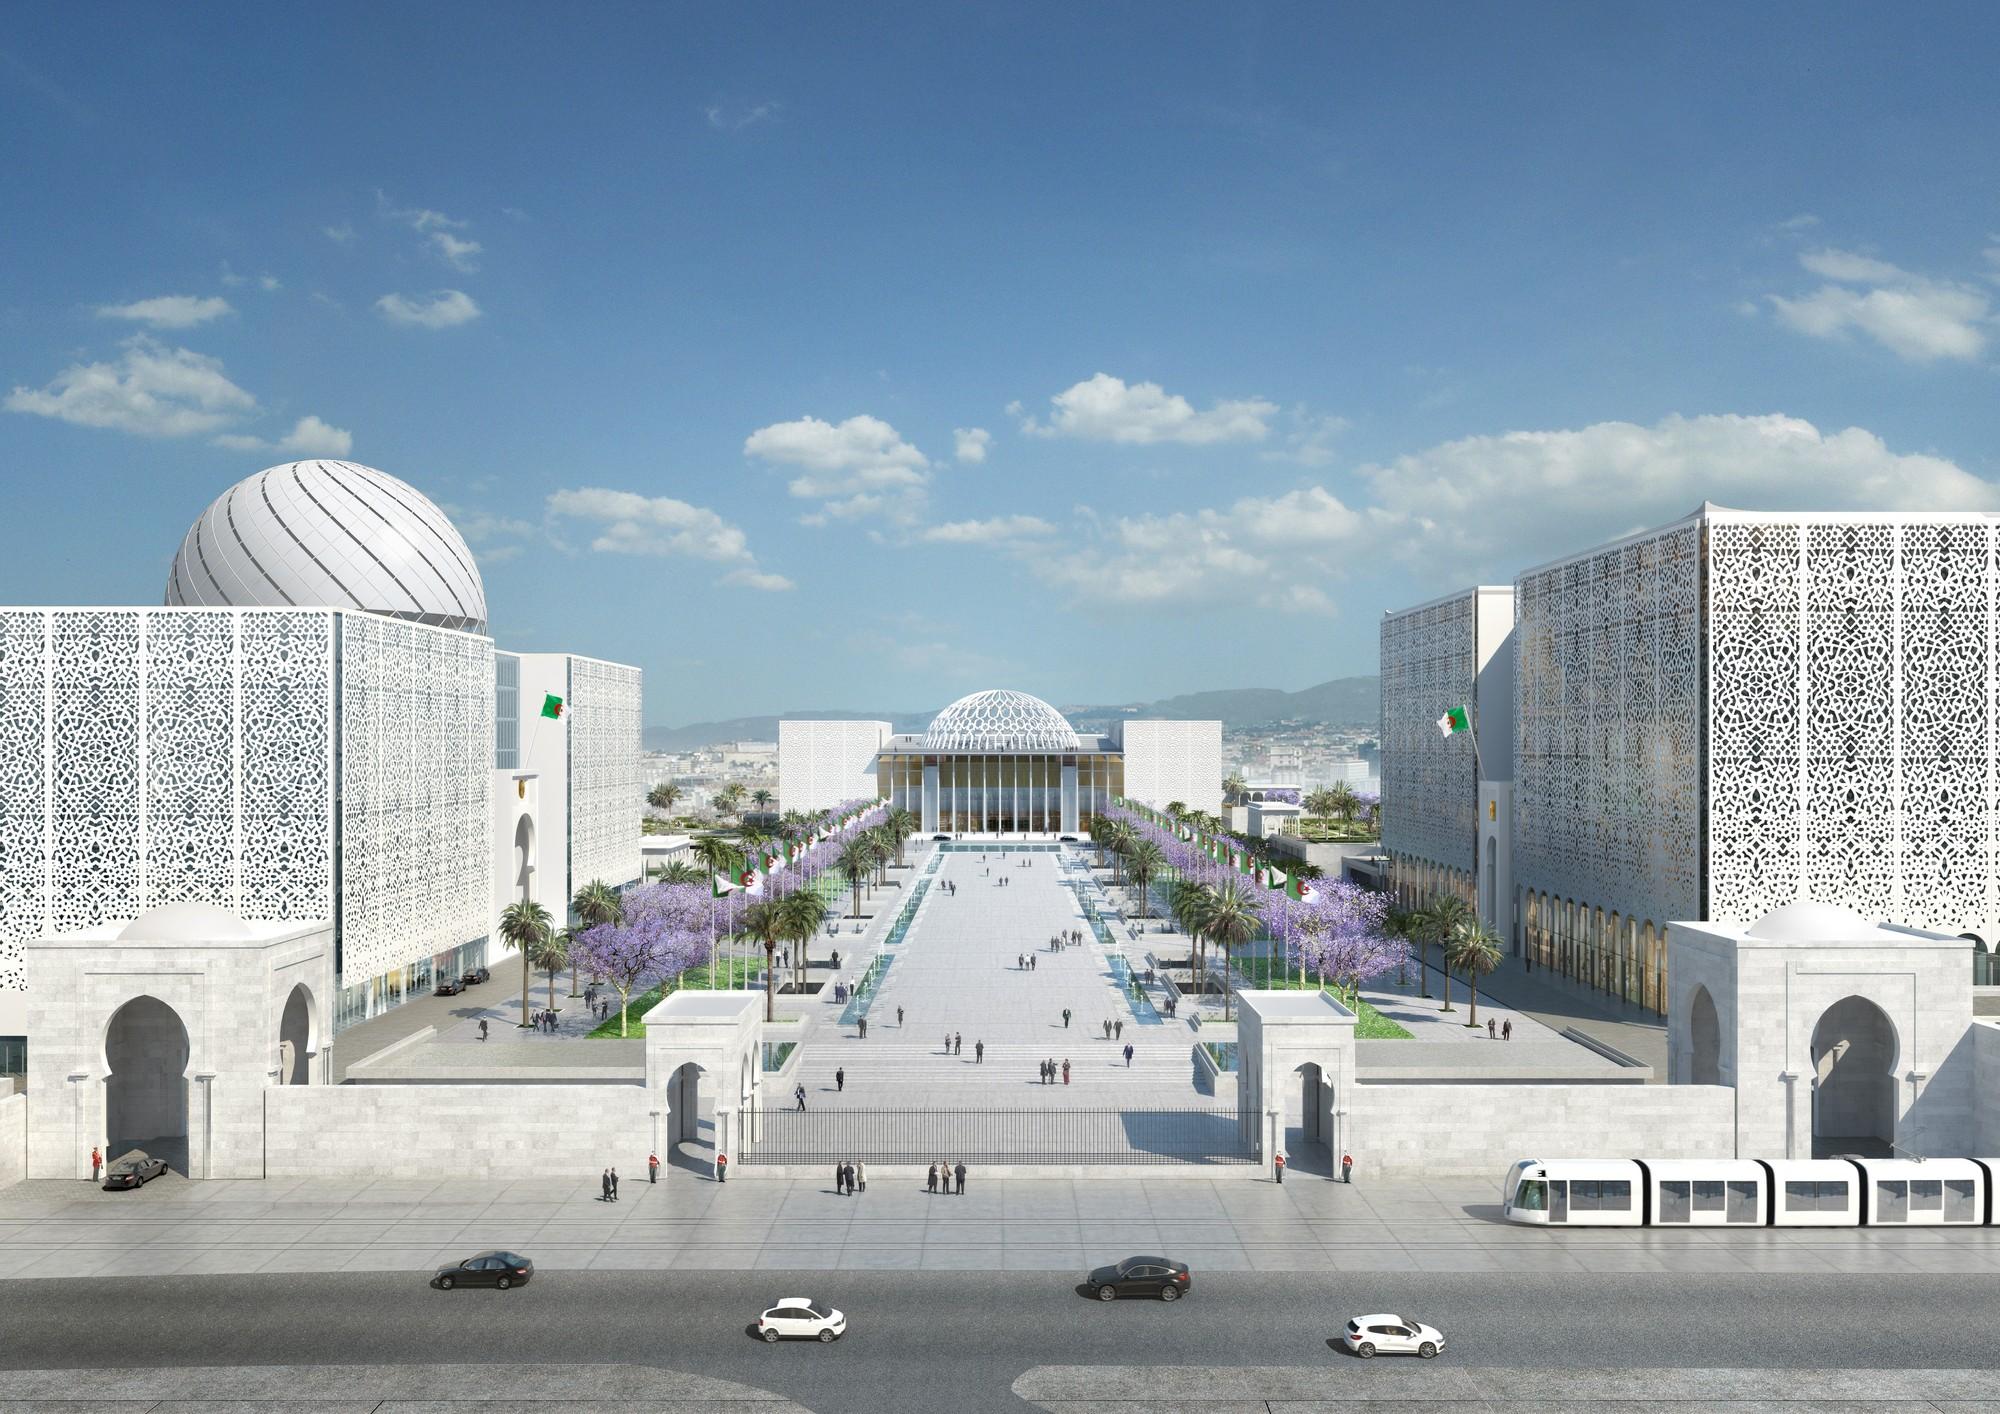 bureau architecture m diterran e designs algerian parliament around a vast plaza archdaily